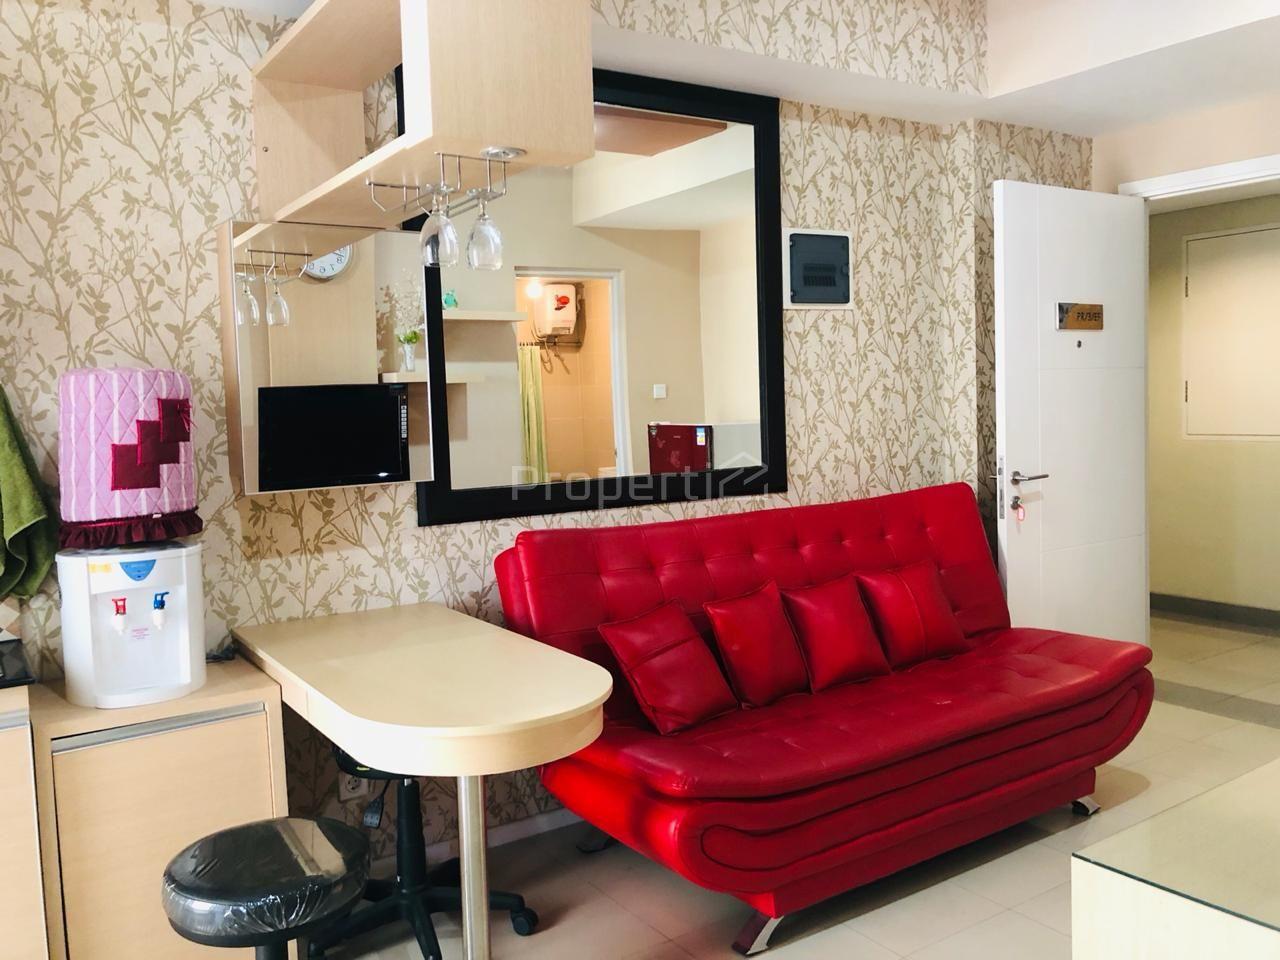 1BR Apartment Unit at Parahyangan Residences, 3rd Floor, Kota Bandung